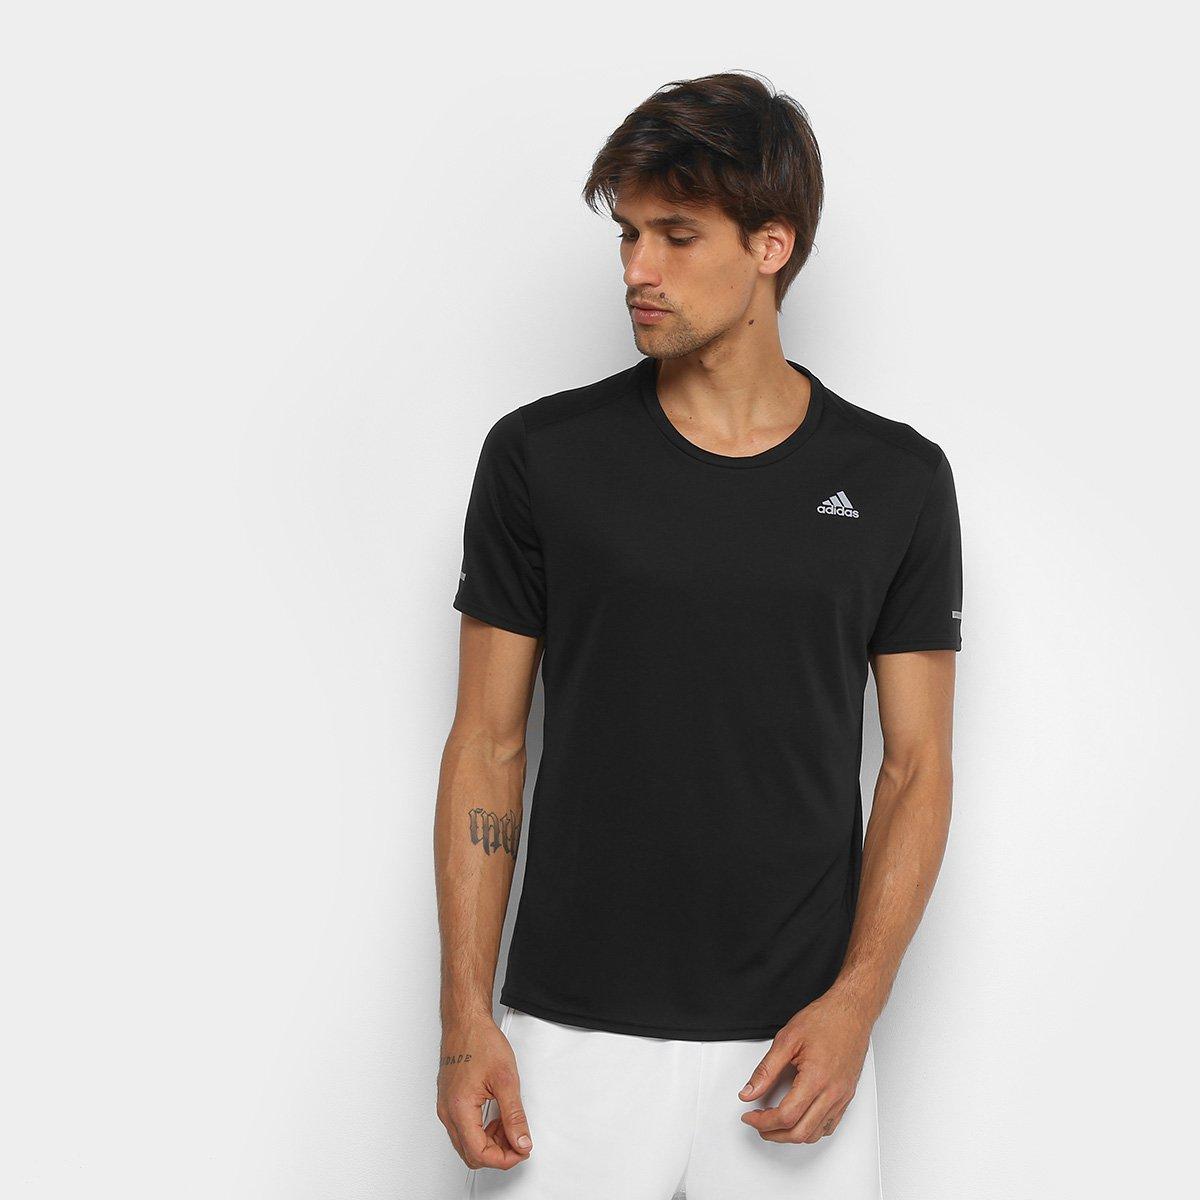 f2dc50e082f Camiseta Adidas Run Masculina - Preto - Compre Agora